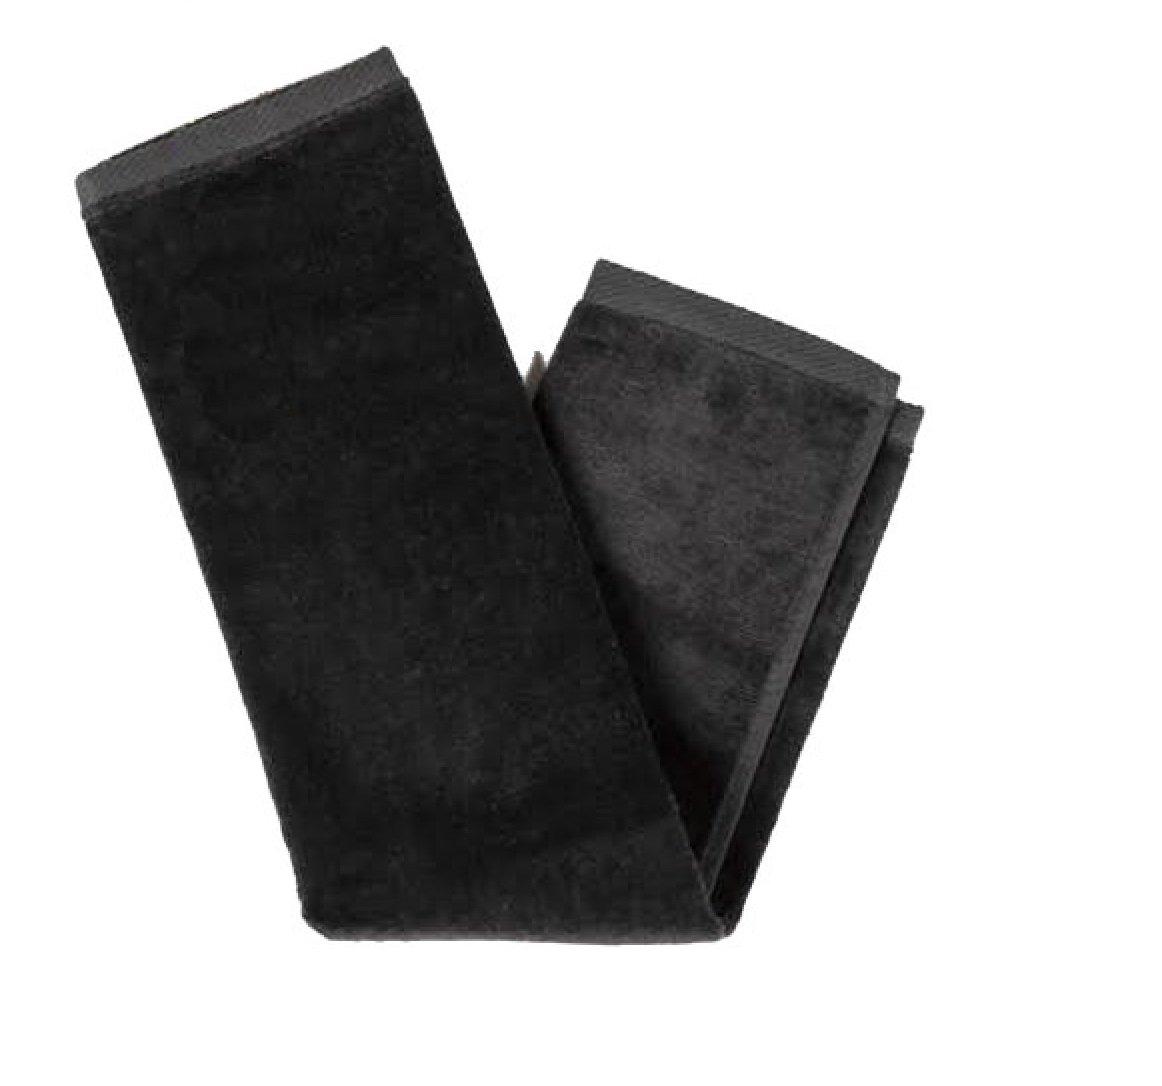 BLACK Color Bulk Fingertip Towels Terry Velour w/Hemmed Ends 100% Cotton (24, BLACK)